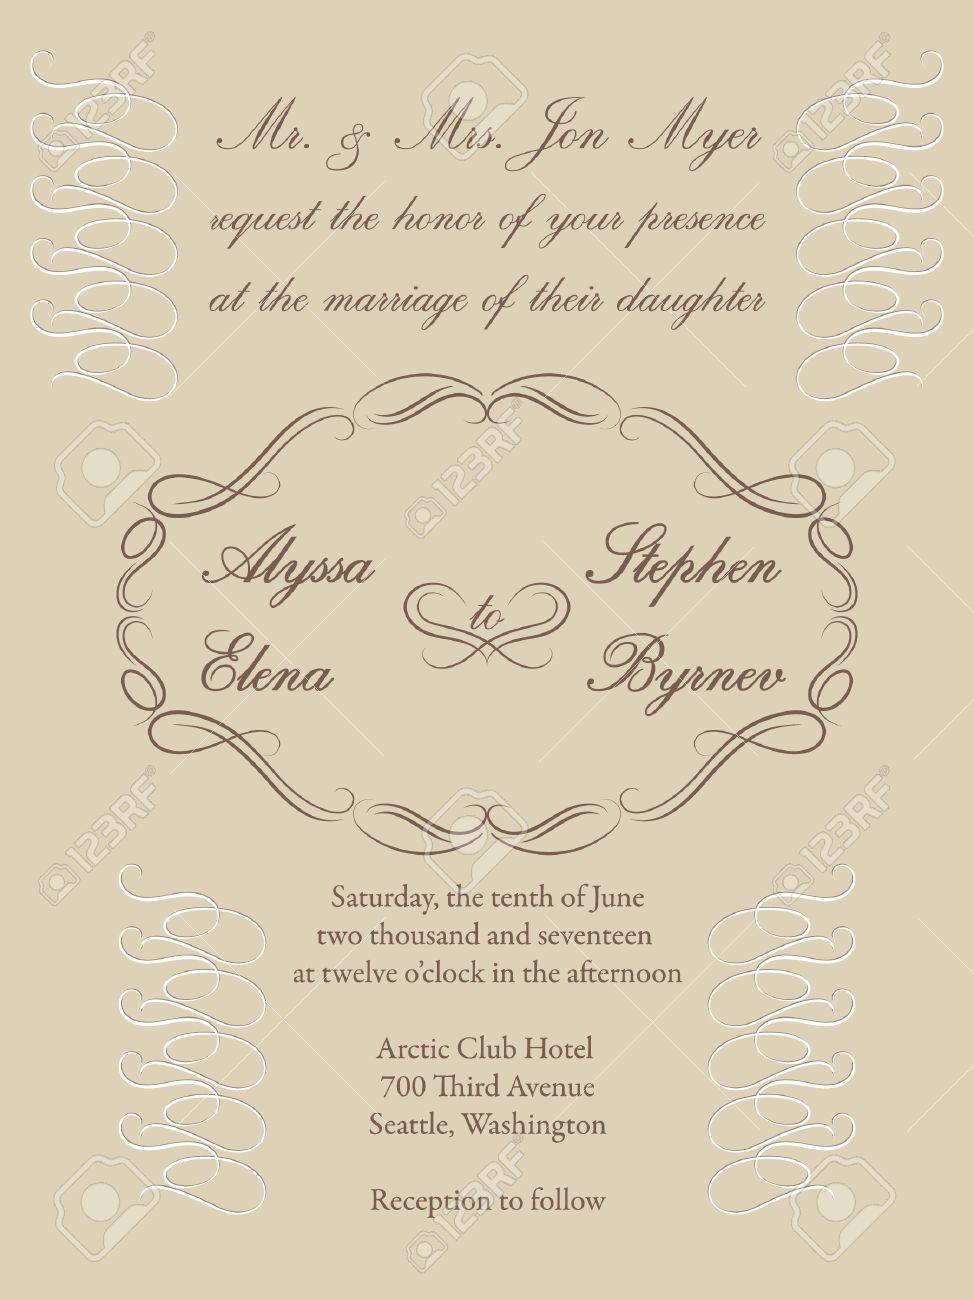 Vignette Frame On A Cream Background For A Formal Wedding Invitation ...